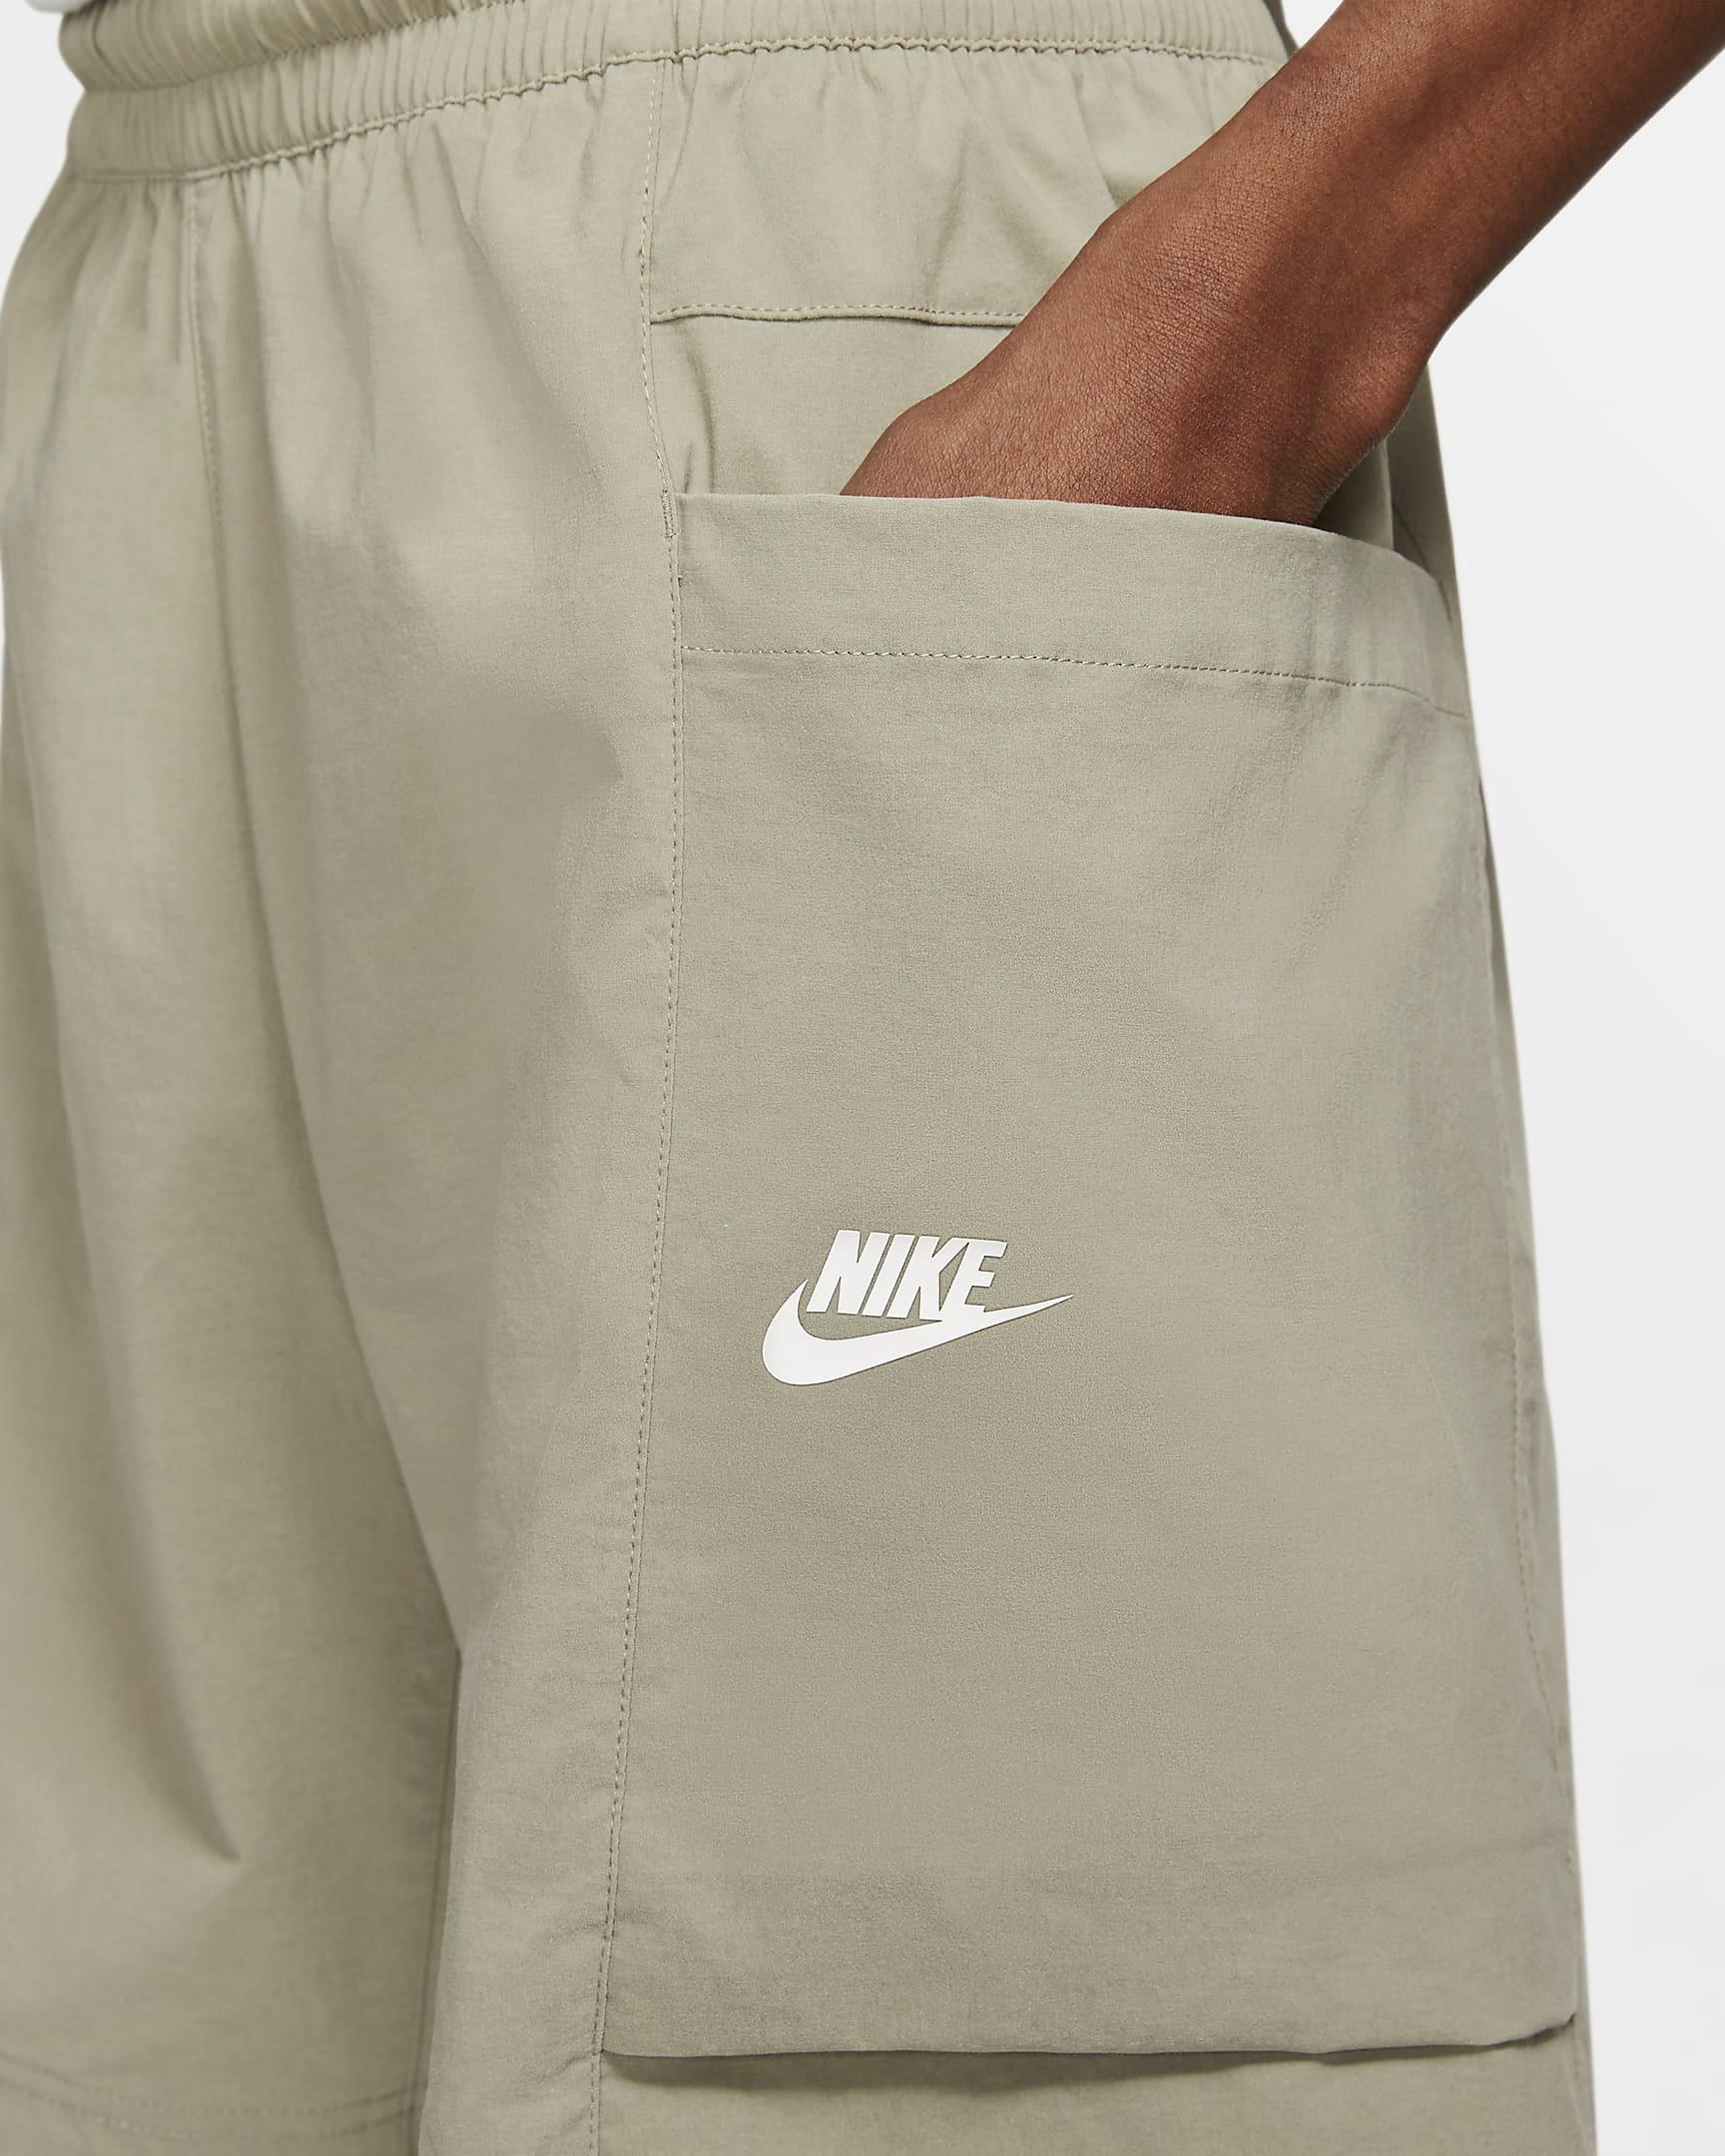 nike-light-army-woven-shorts-2